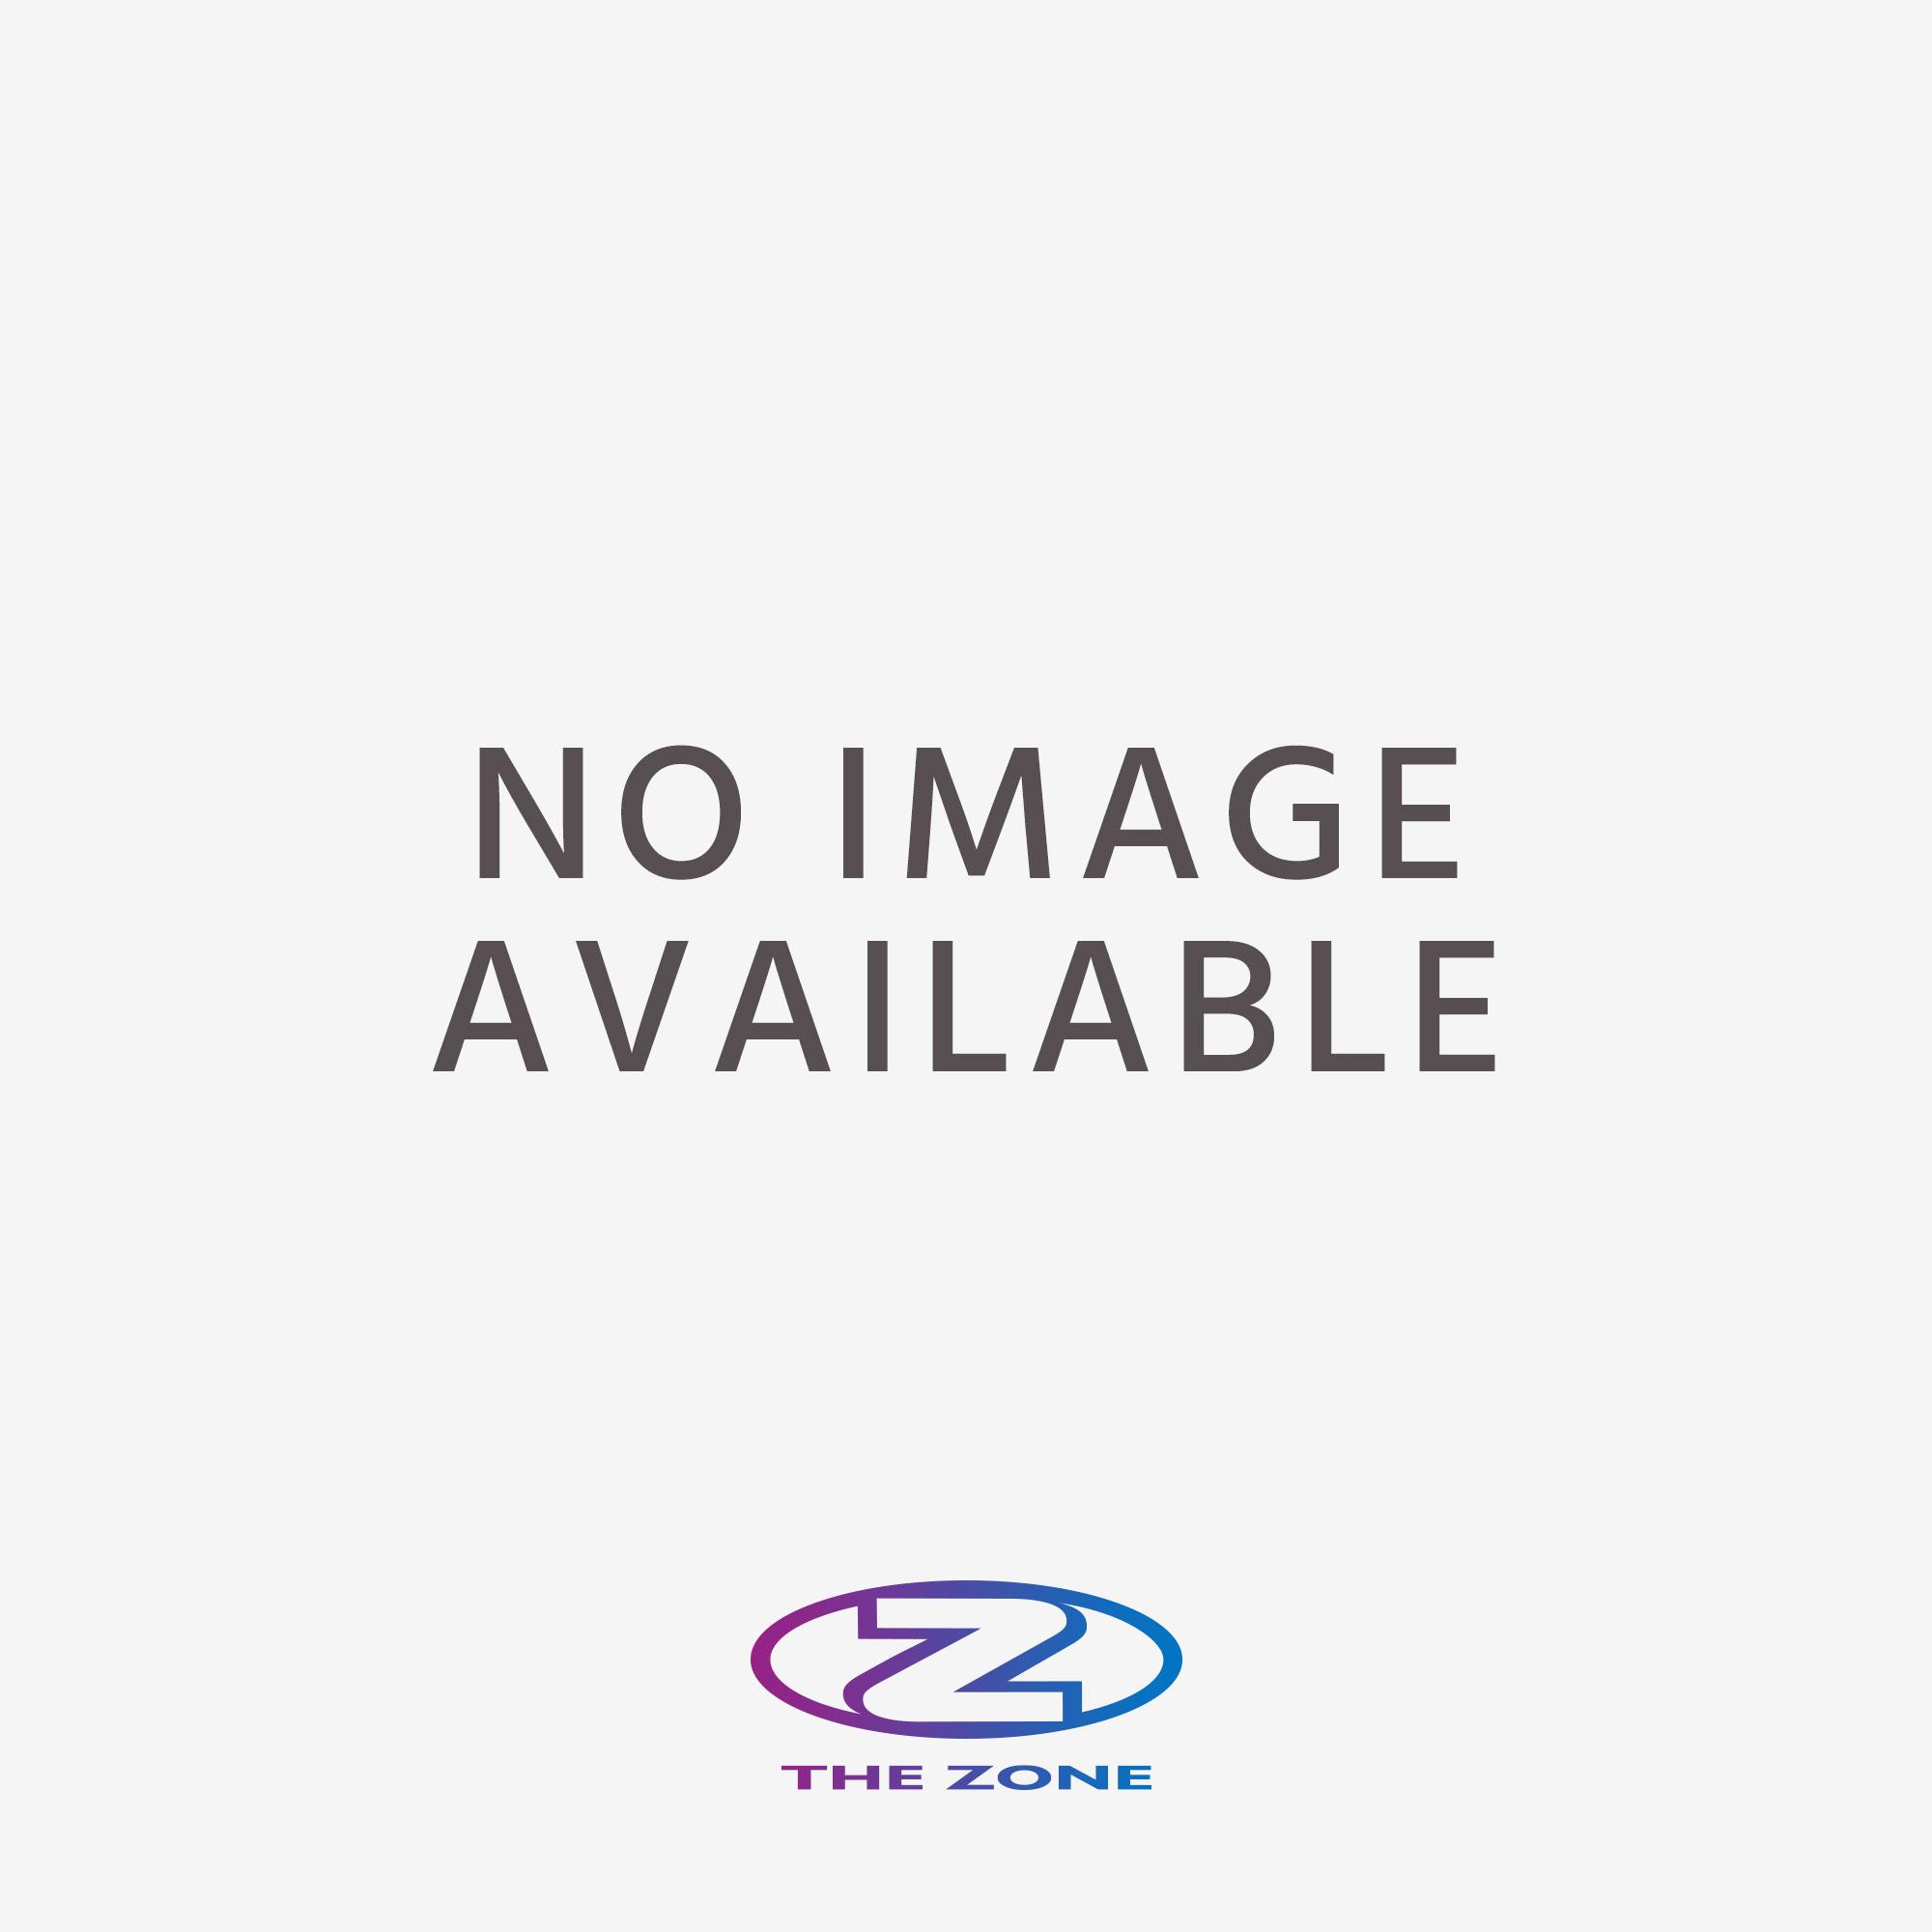 Chic Shiny Nylon Lycra Gymnastics Crop Top with Crystals  c097d3ce16f